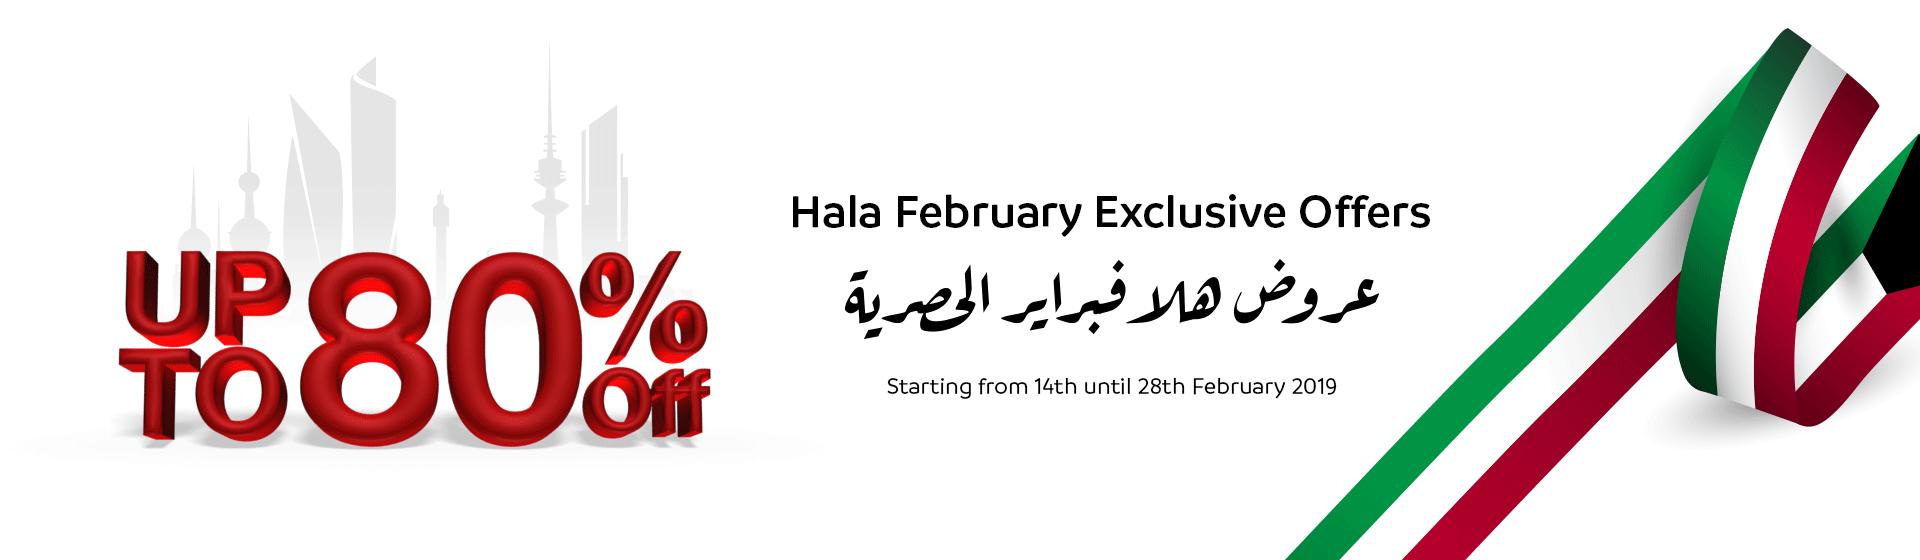 Hala February